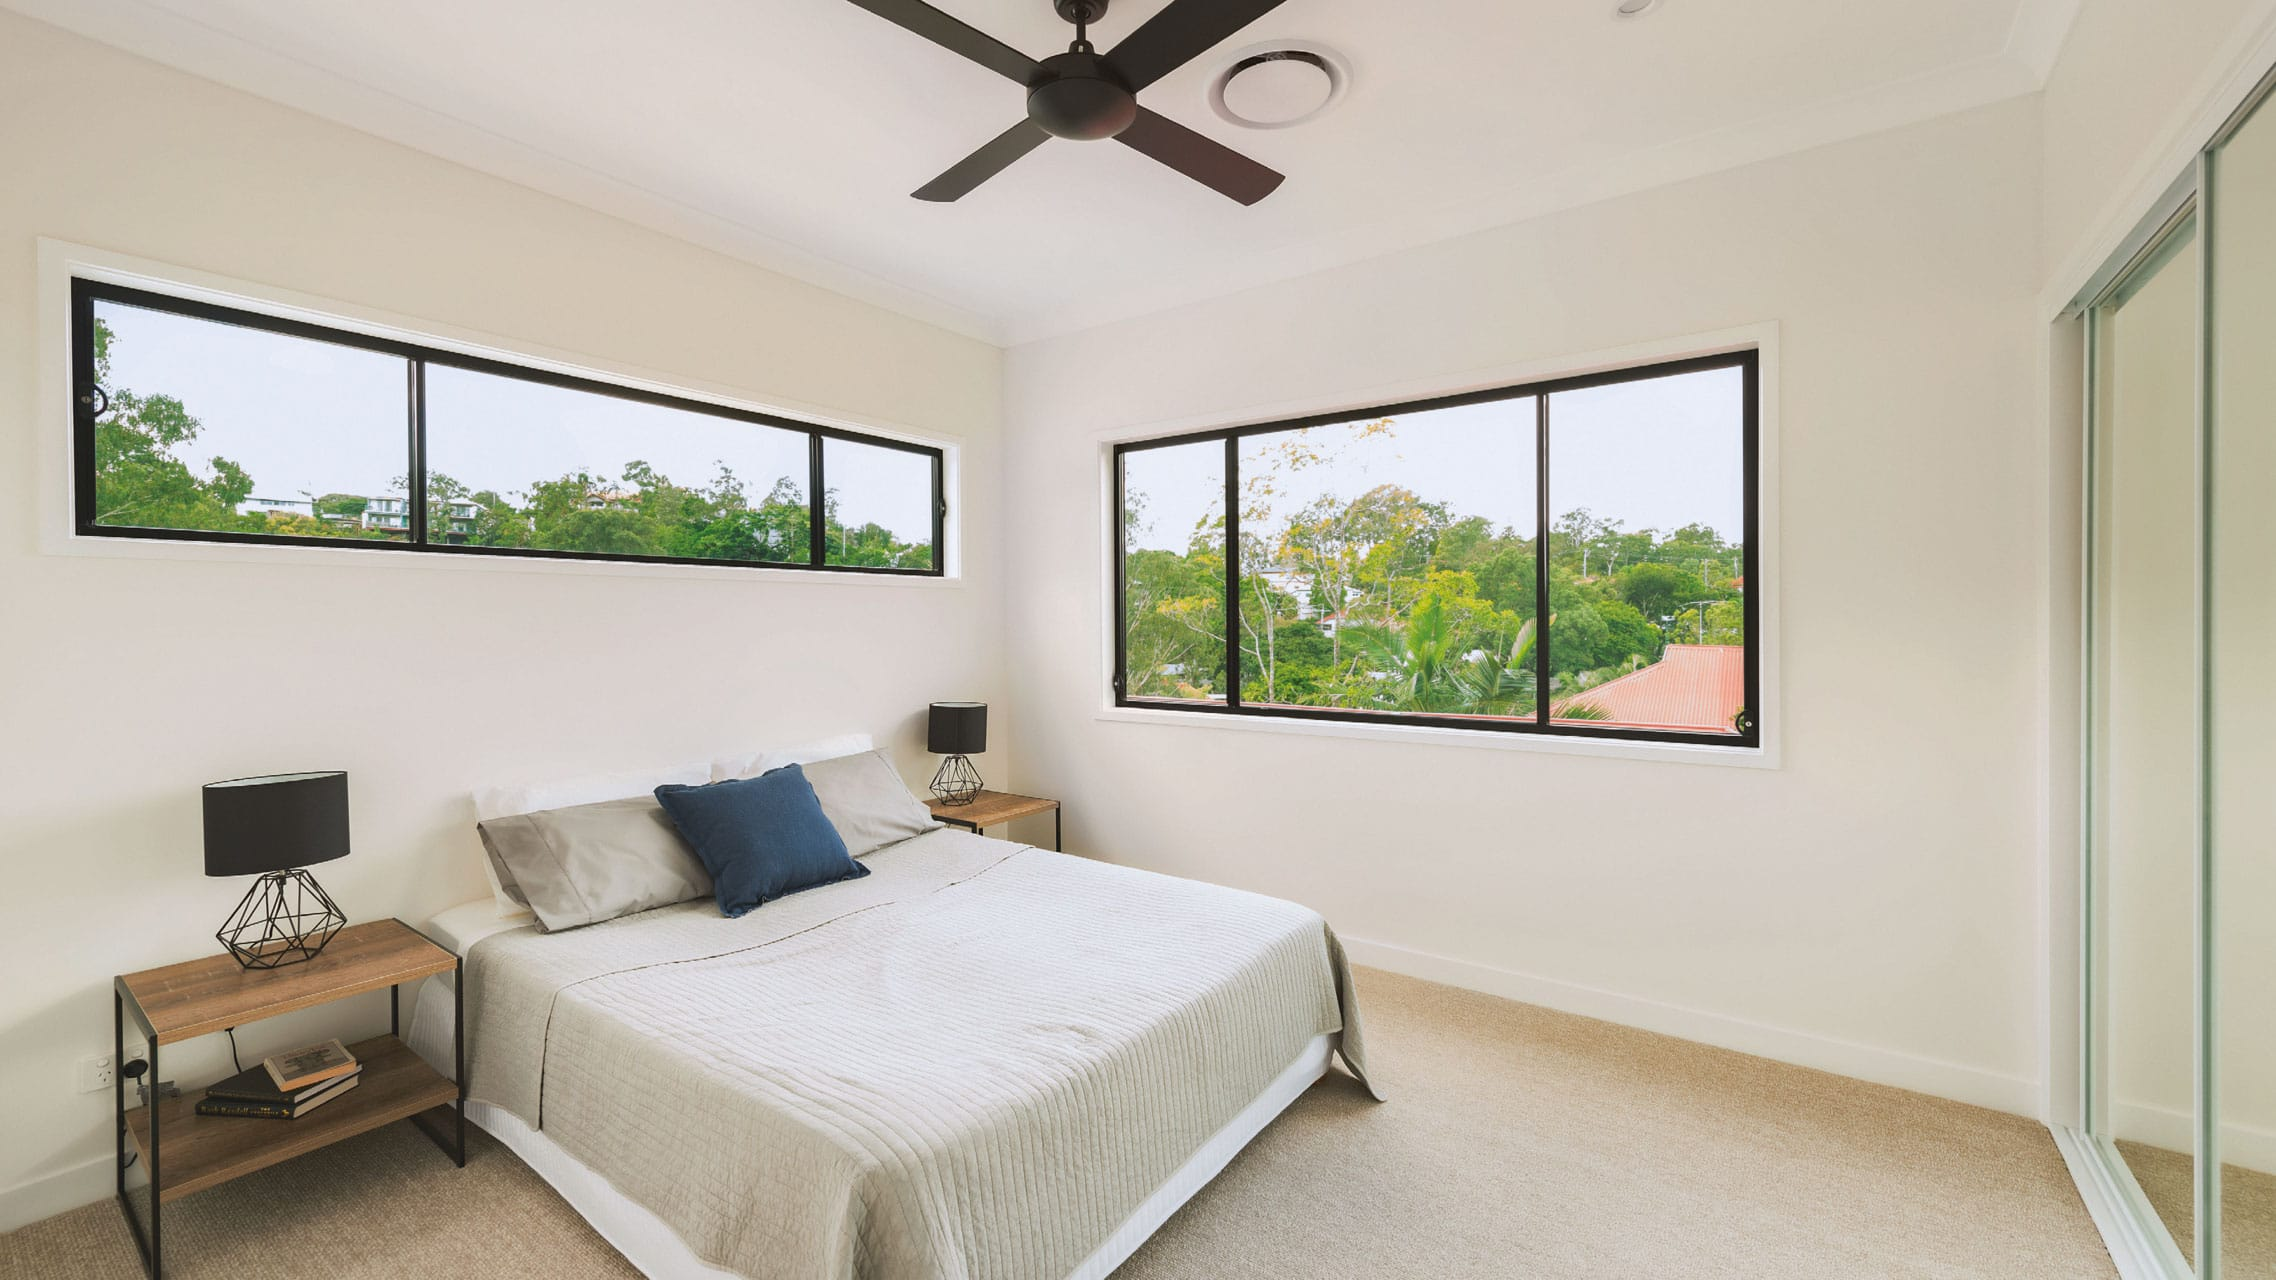 Two Aluminium Sliding Windows in the bedroom